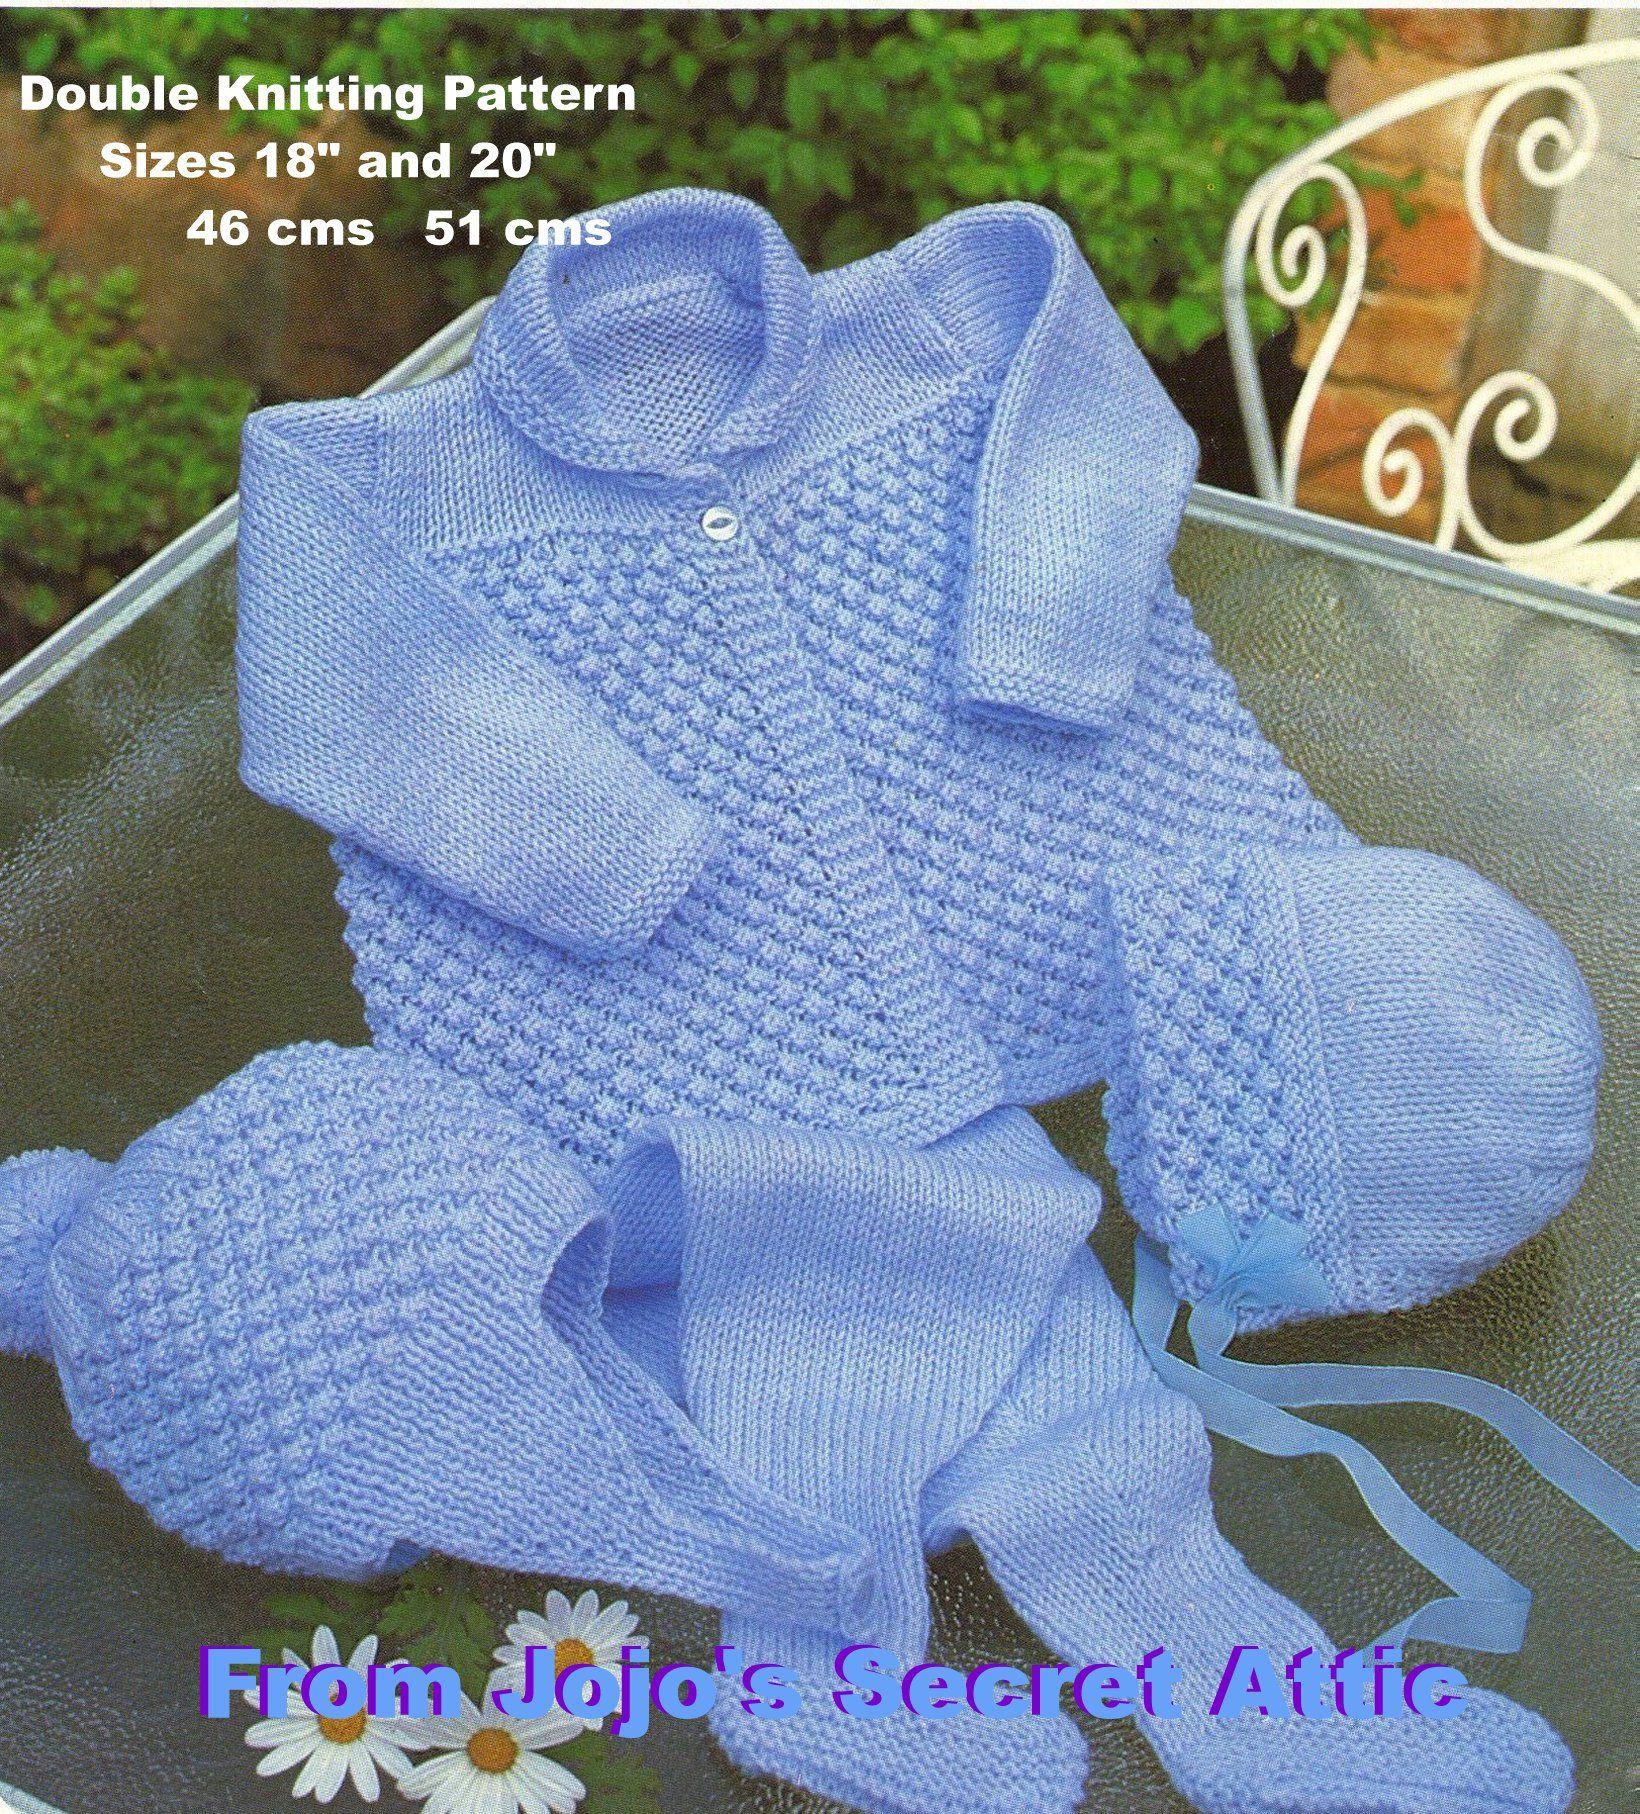 Double Knitting Pattern Pram Set | Pram sets, Double knitting and ...